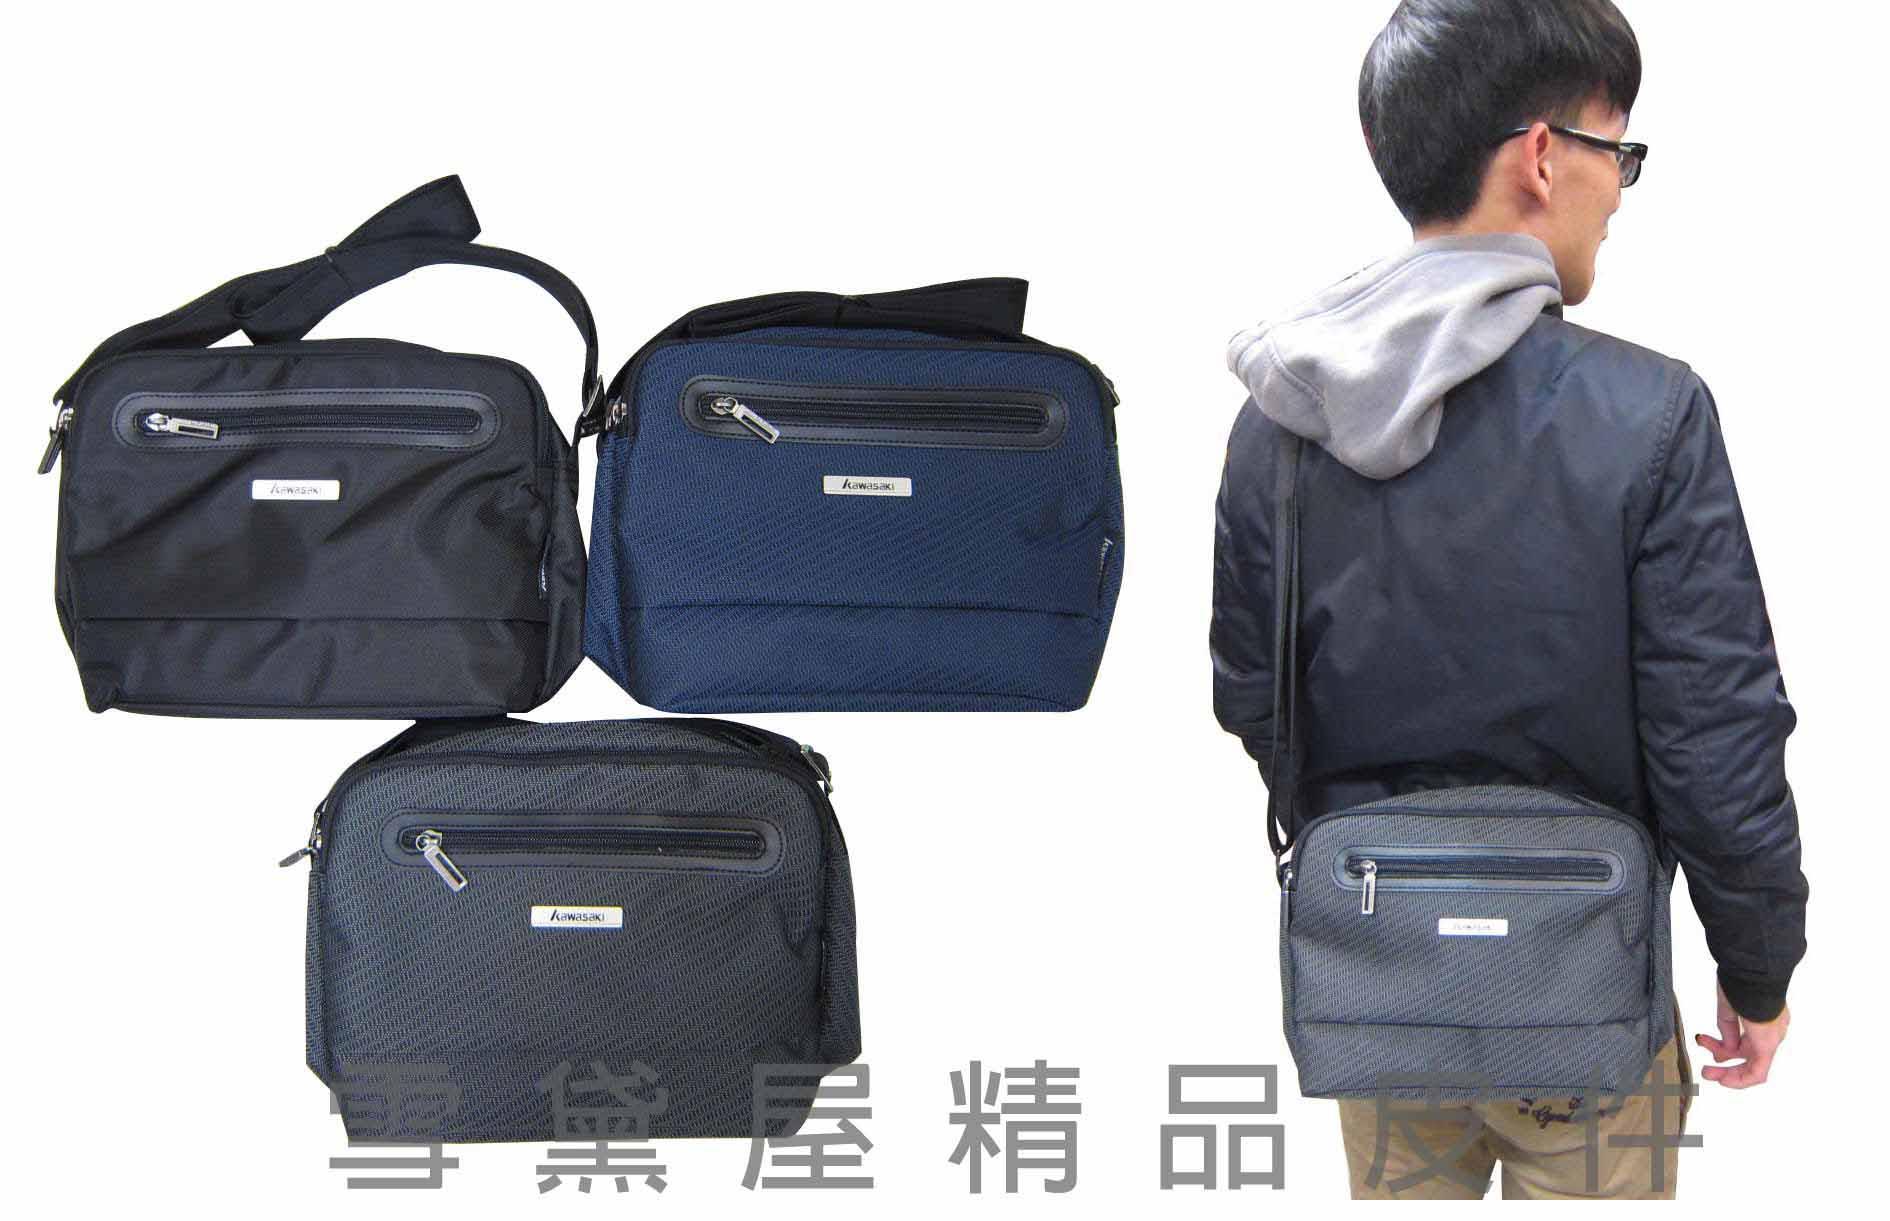 <br/><br/> ~雪黛屋~KAWAKSAKI 斜側包台灣製造二層主袋可放10吋電腦高單數防水尼龍布+皮革隨身物品專用 HKA207<br/><br/>